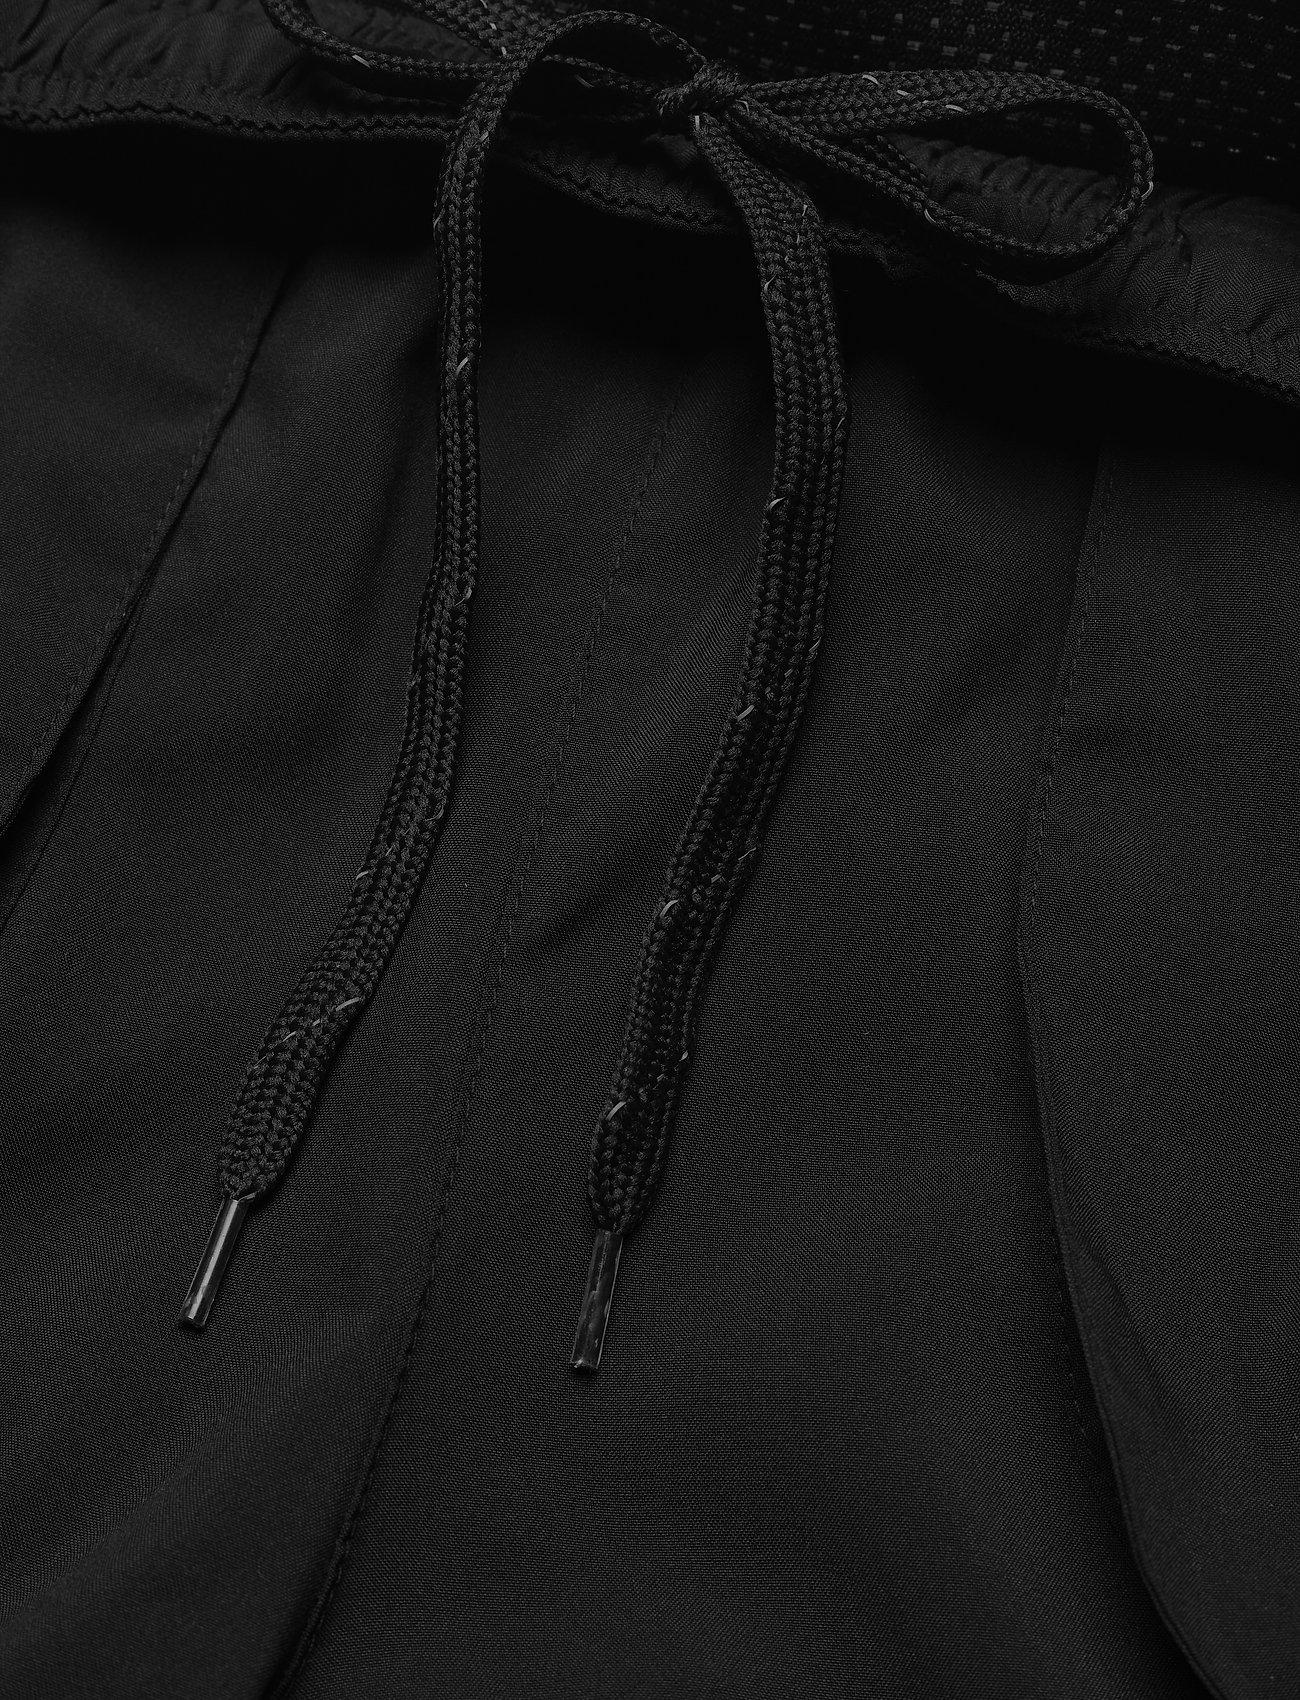 Soulland - Harley shorts - krótkie spodenki - black - 5